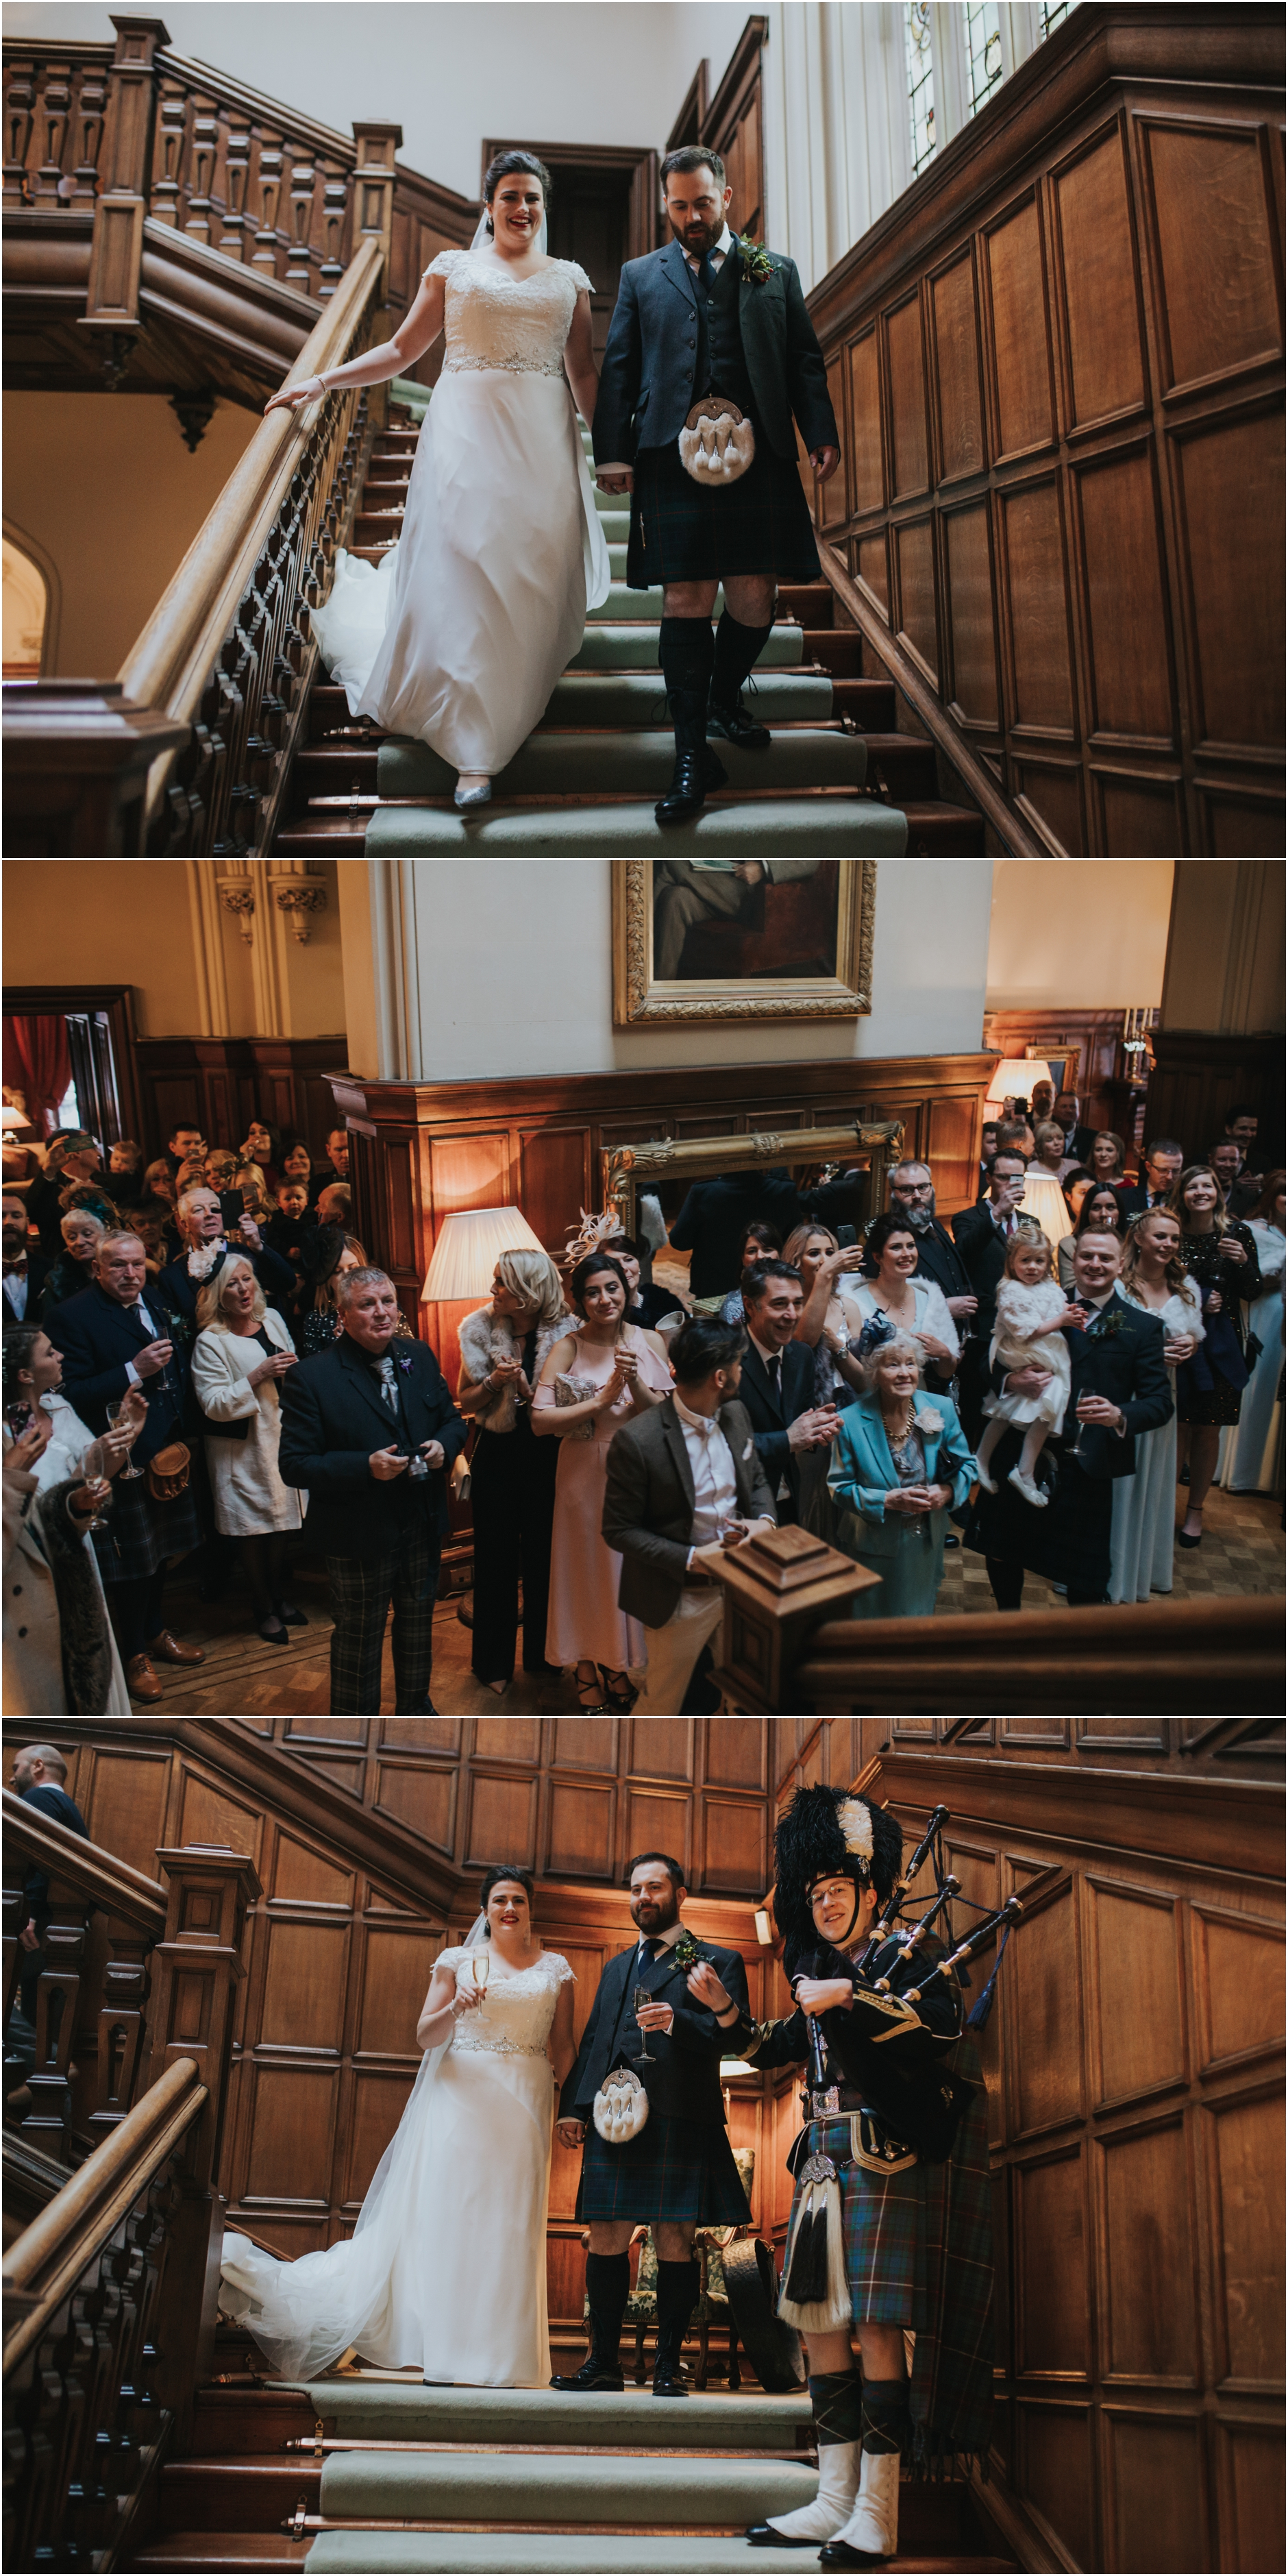 dundas castle wedding winter bride and groom make their entrance in the castle